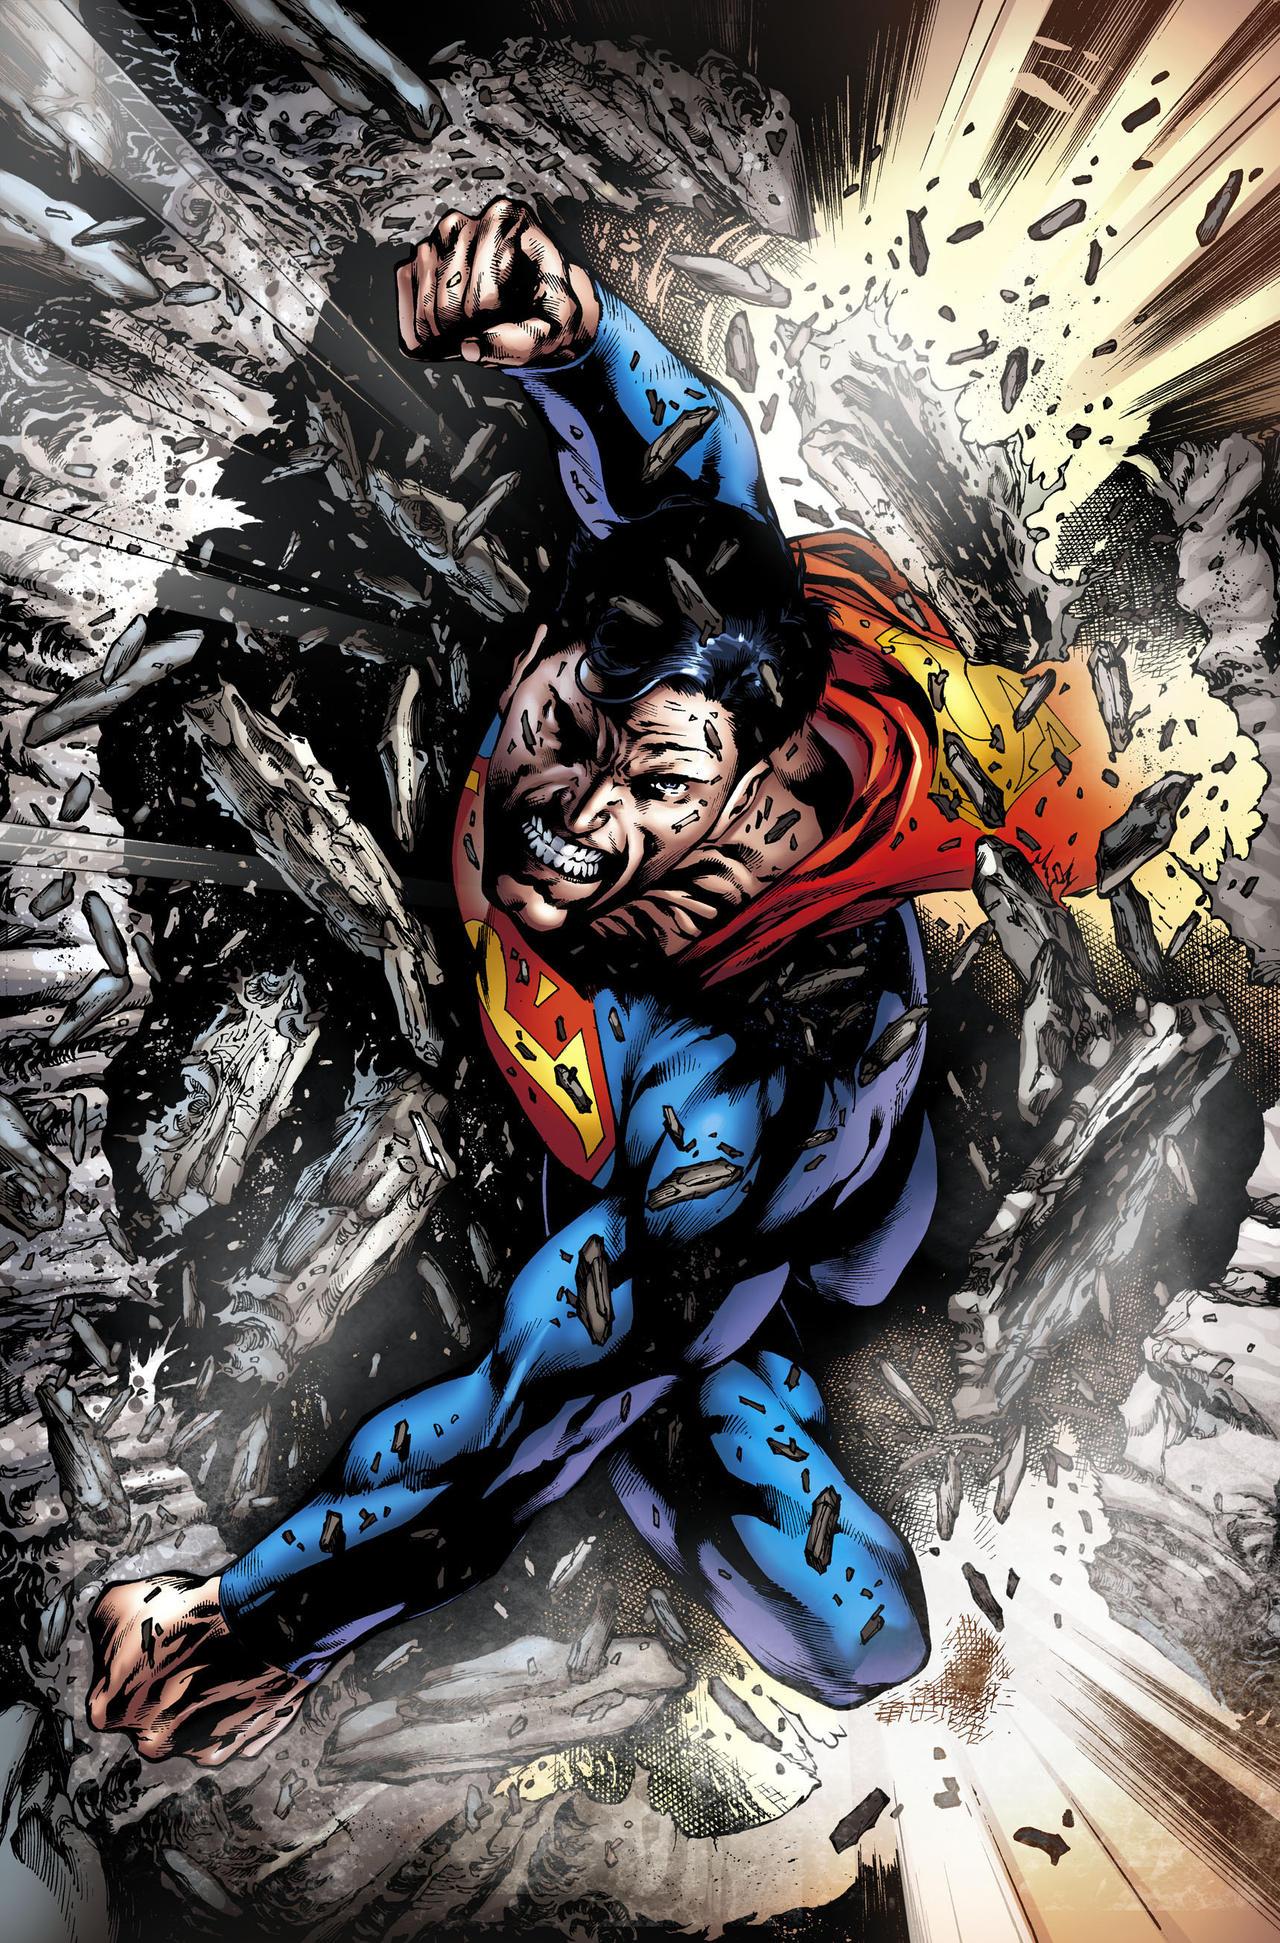 New artist of the Superman by eddybarrows